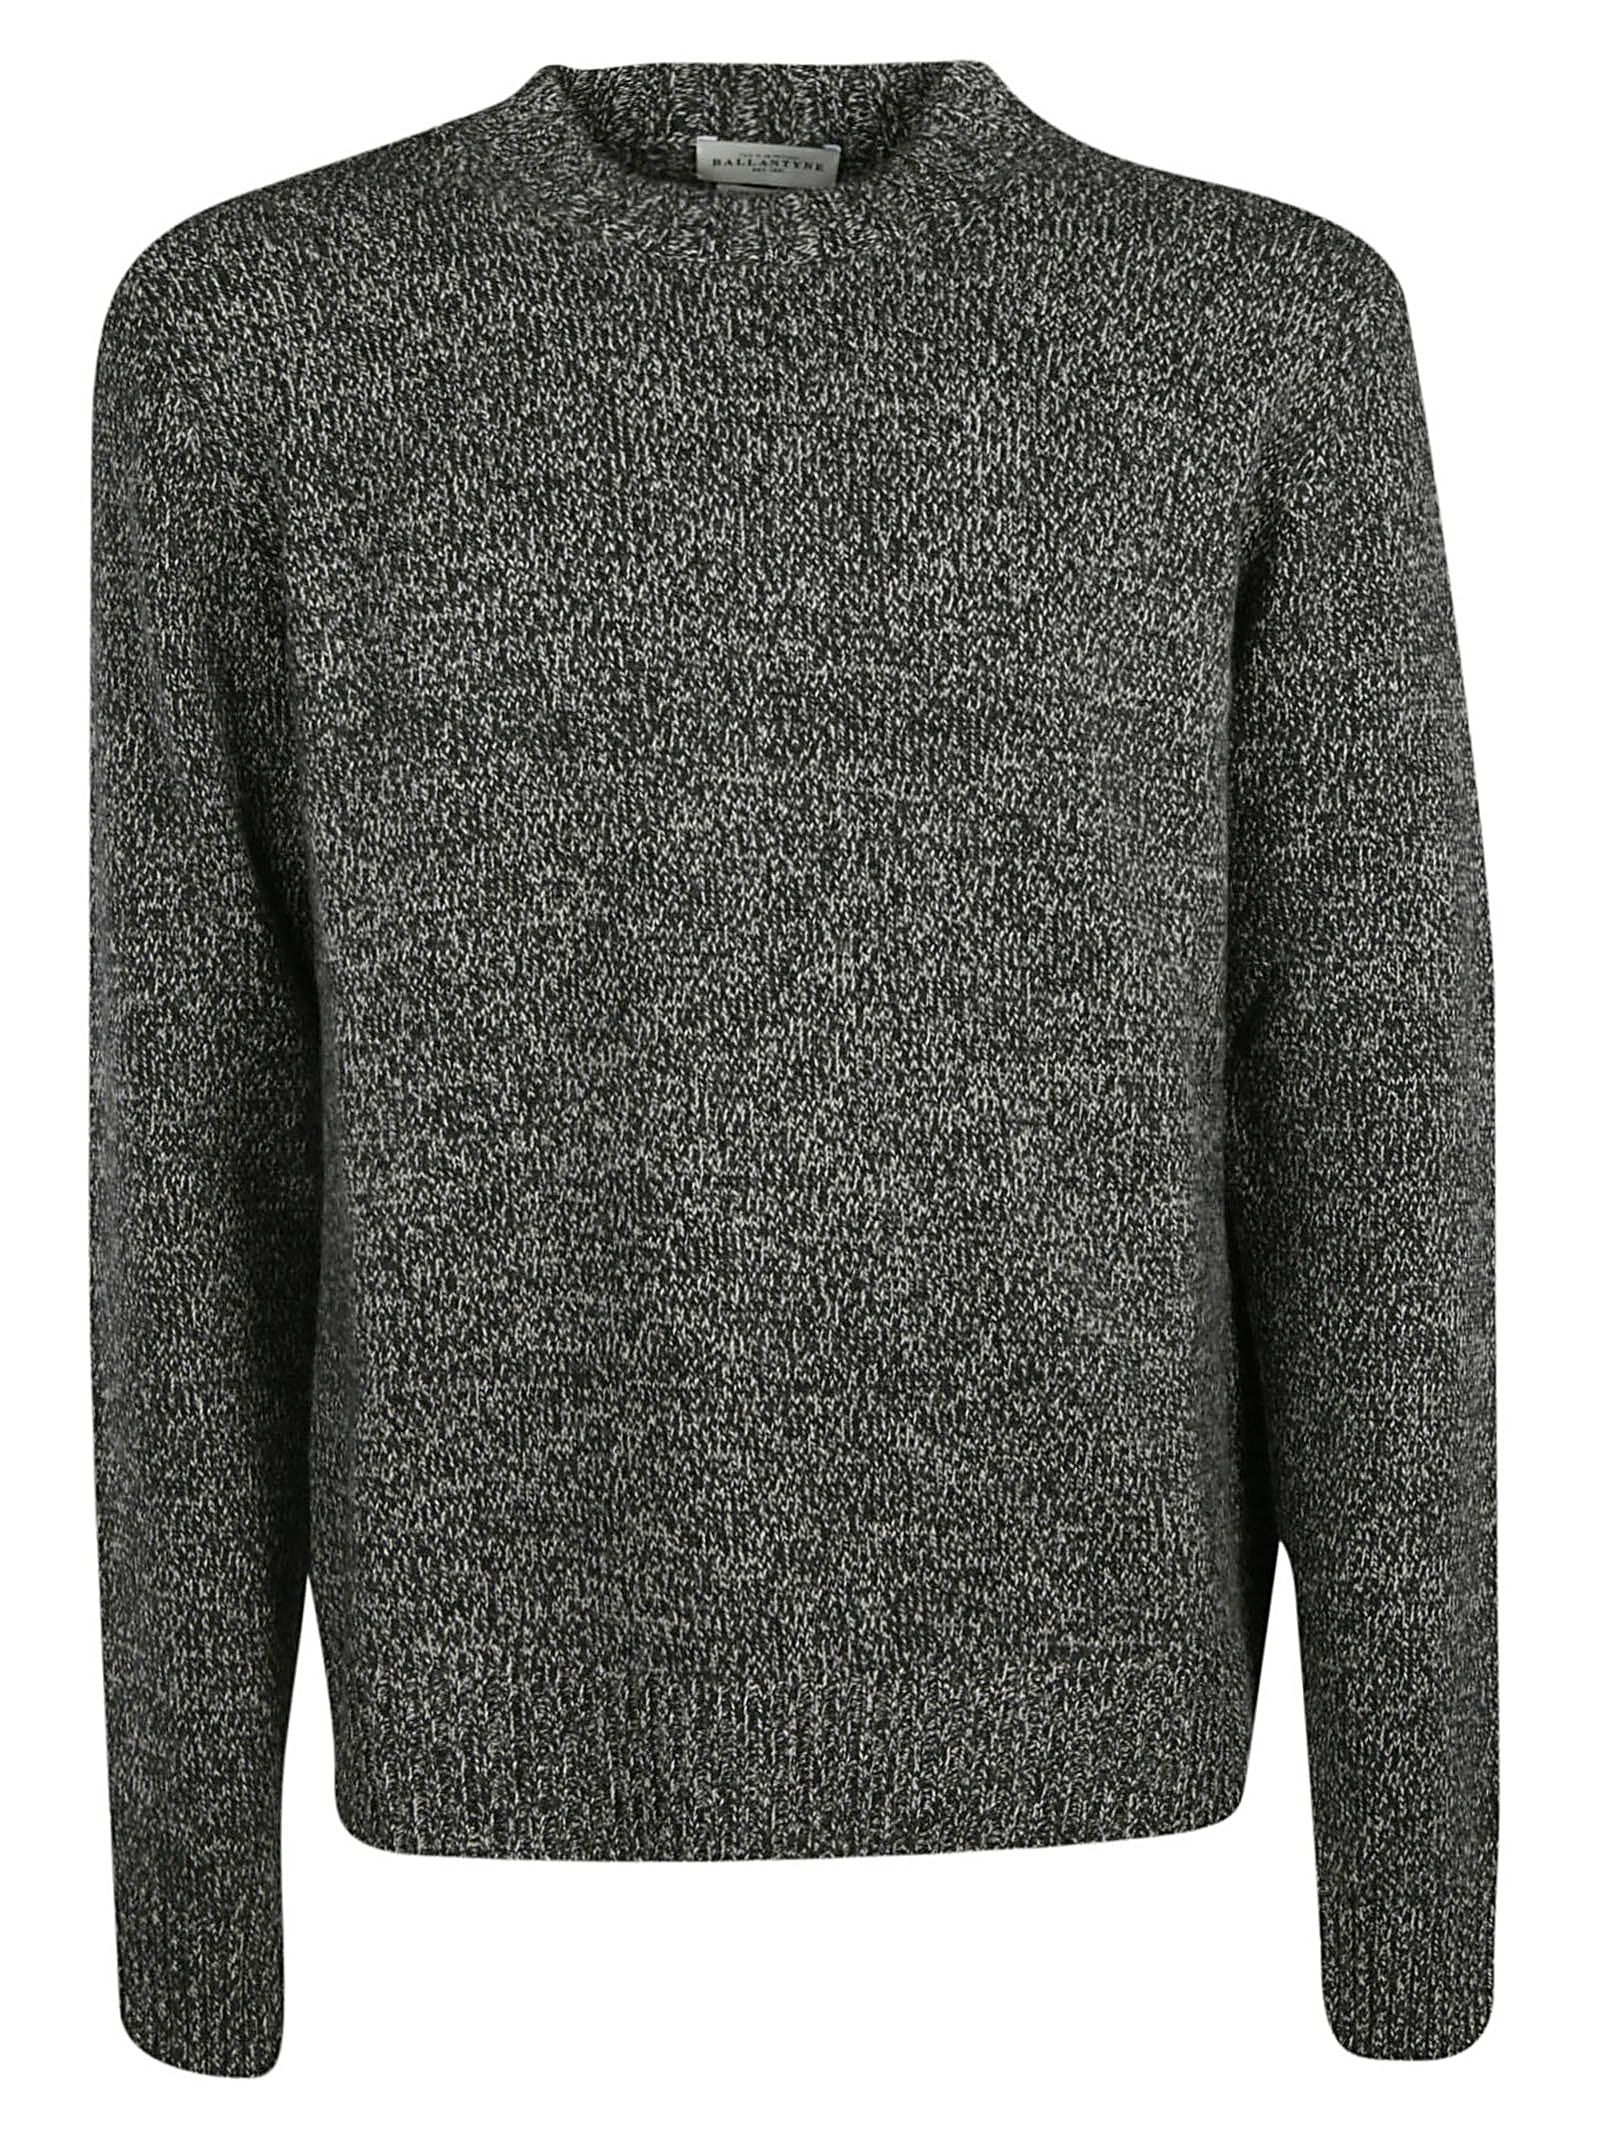 Ballantyne Flecked Sweater